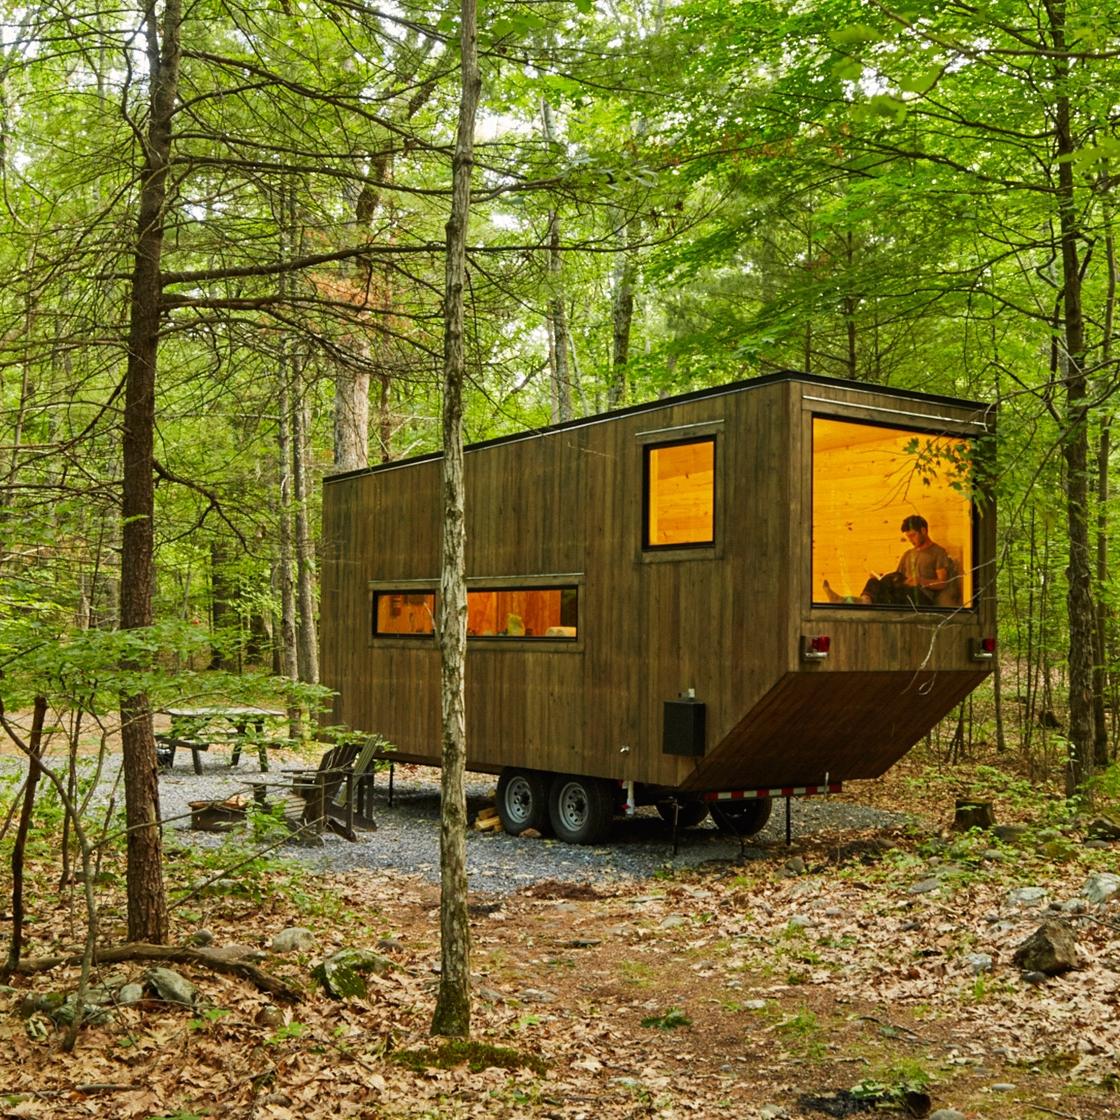 getaway-cabin-maisie-photo-roderick-aichinger_dezeen_1568_5.jpg